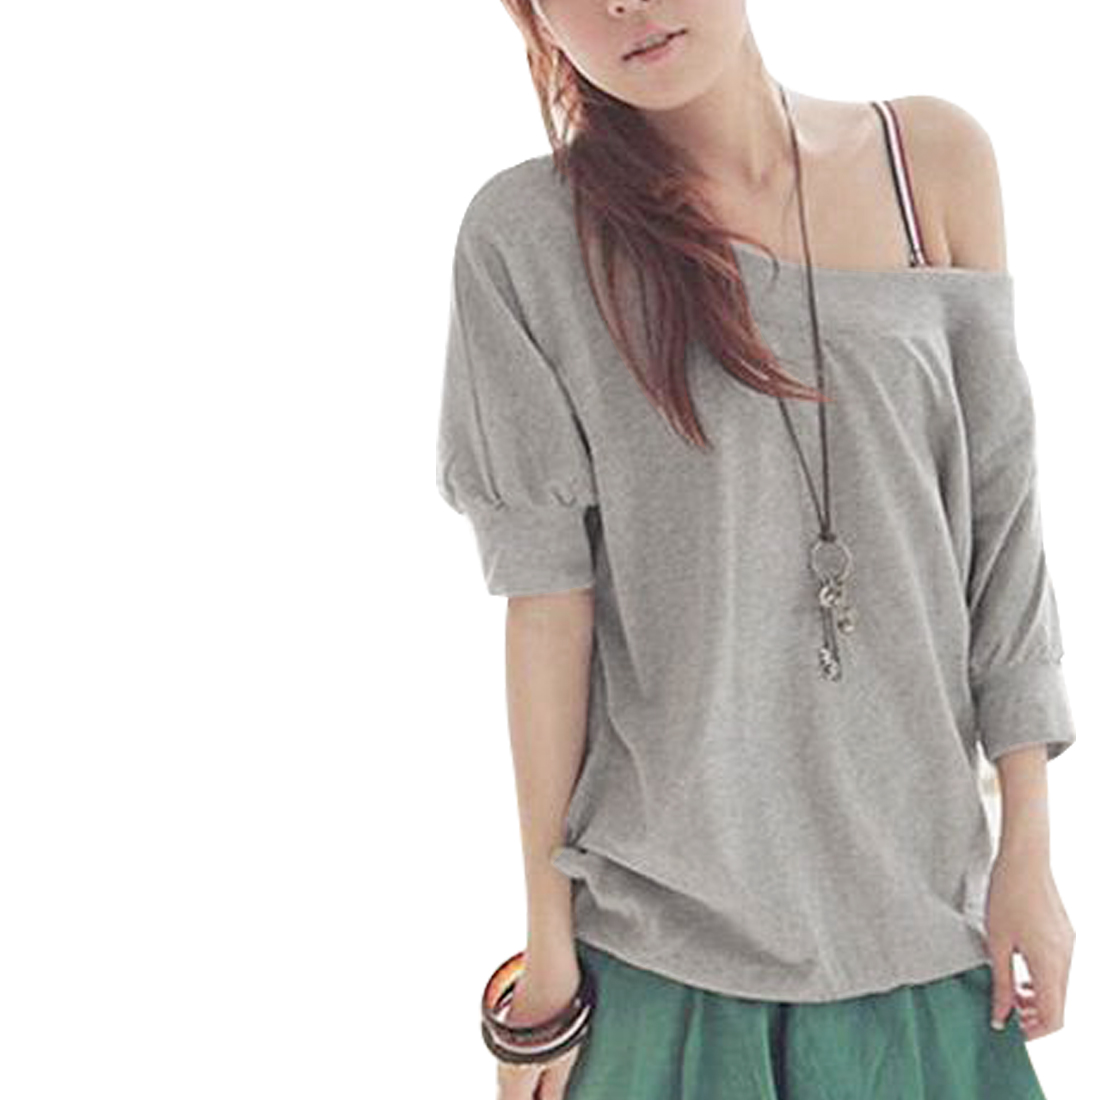 Gray Round Neck Rib Short Sleeve Summer T-Shirt for Women XS